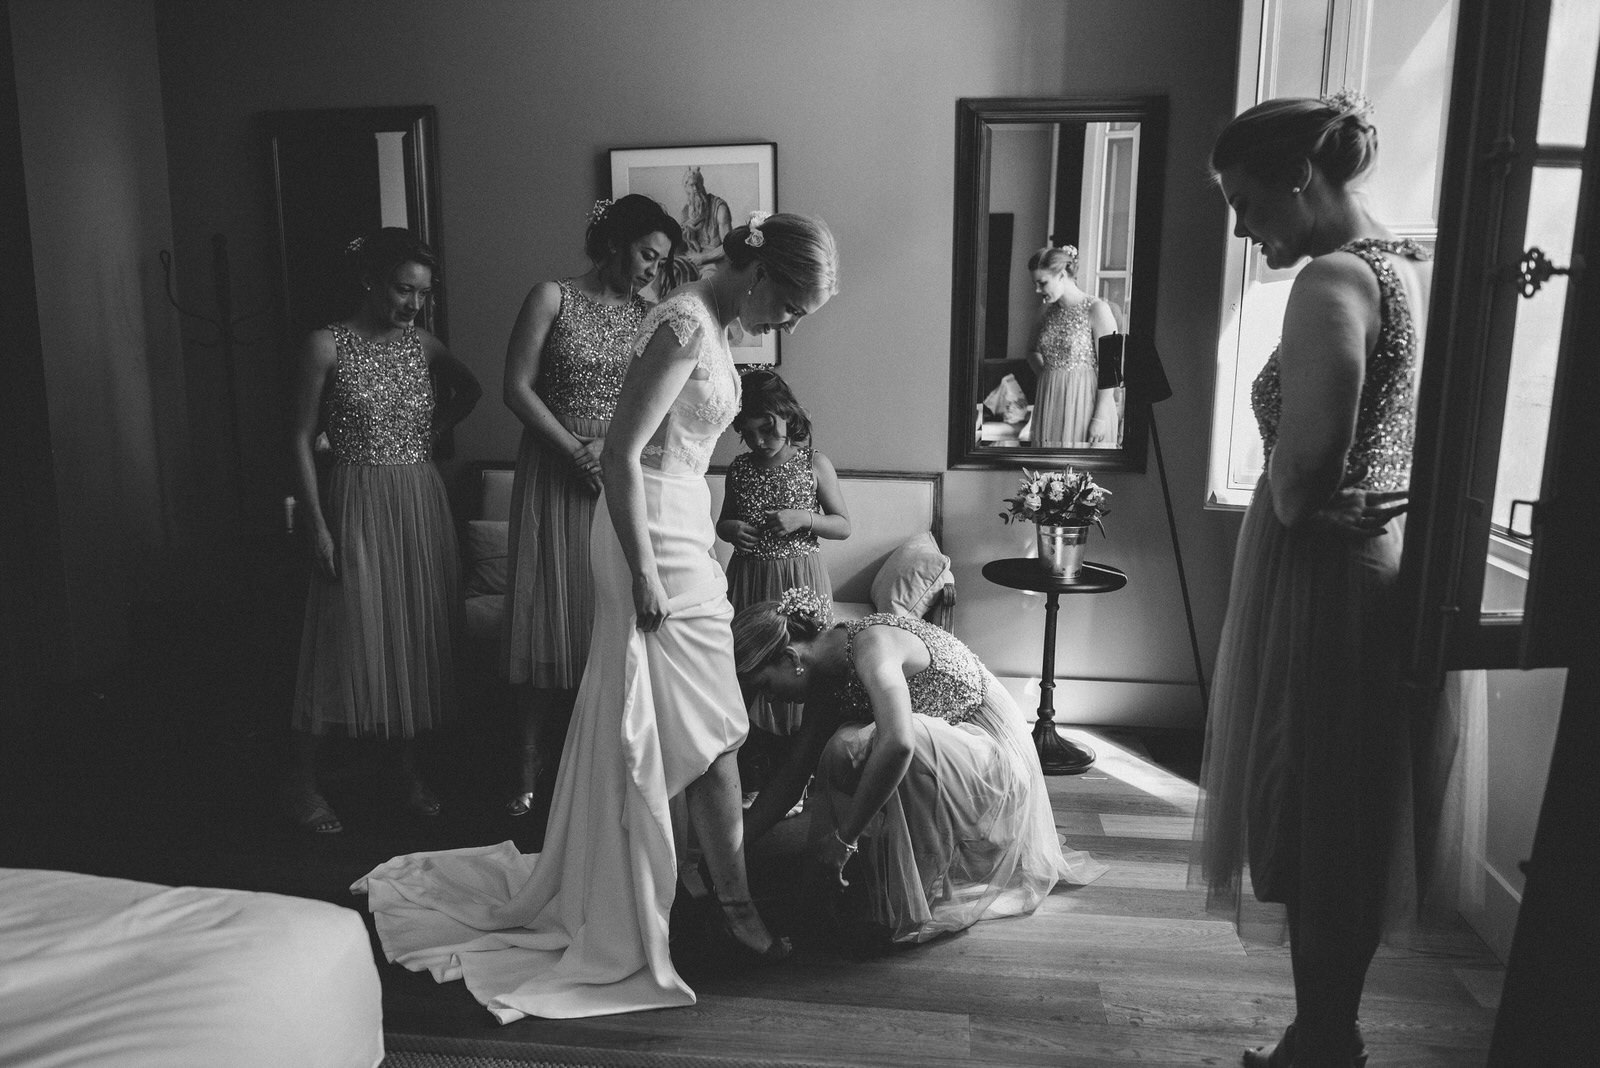 007-LOURMARIN-WEDDING-PHOTOGRAPHER-PROVENCE-WEDDING-ALTERNATIVE-WEDDING-PHOTOGRAPHY-FRANCE-PROVENCE-GARDEN-WEDDING.JPG